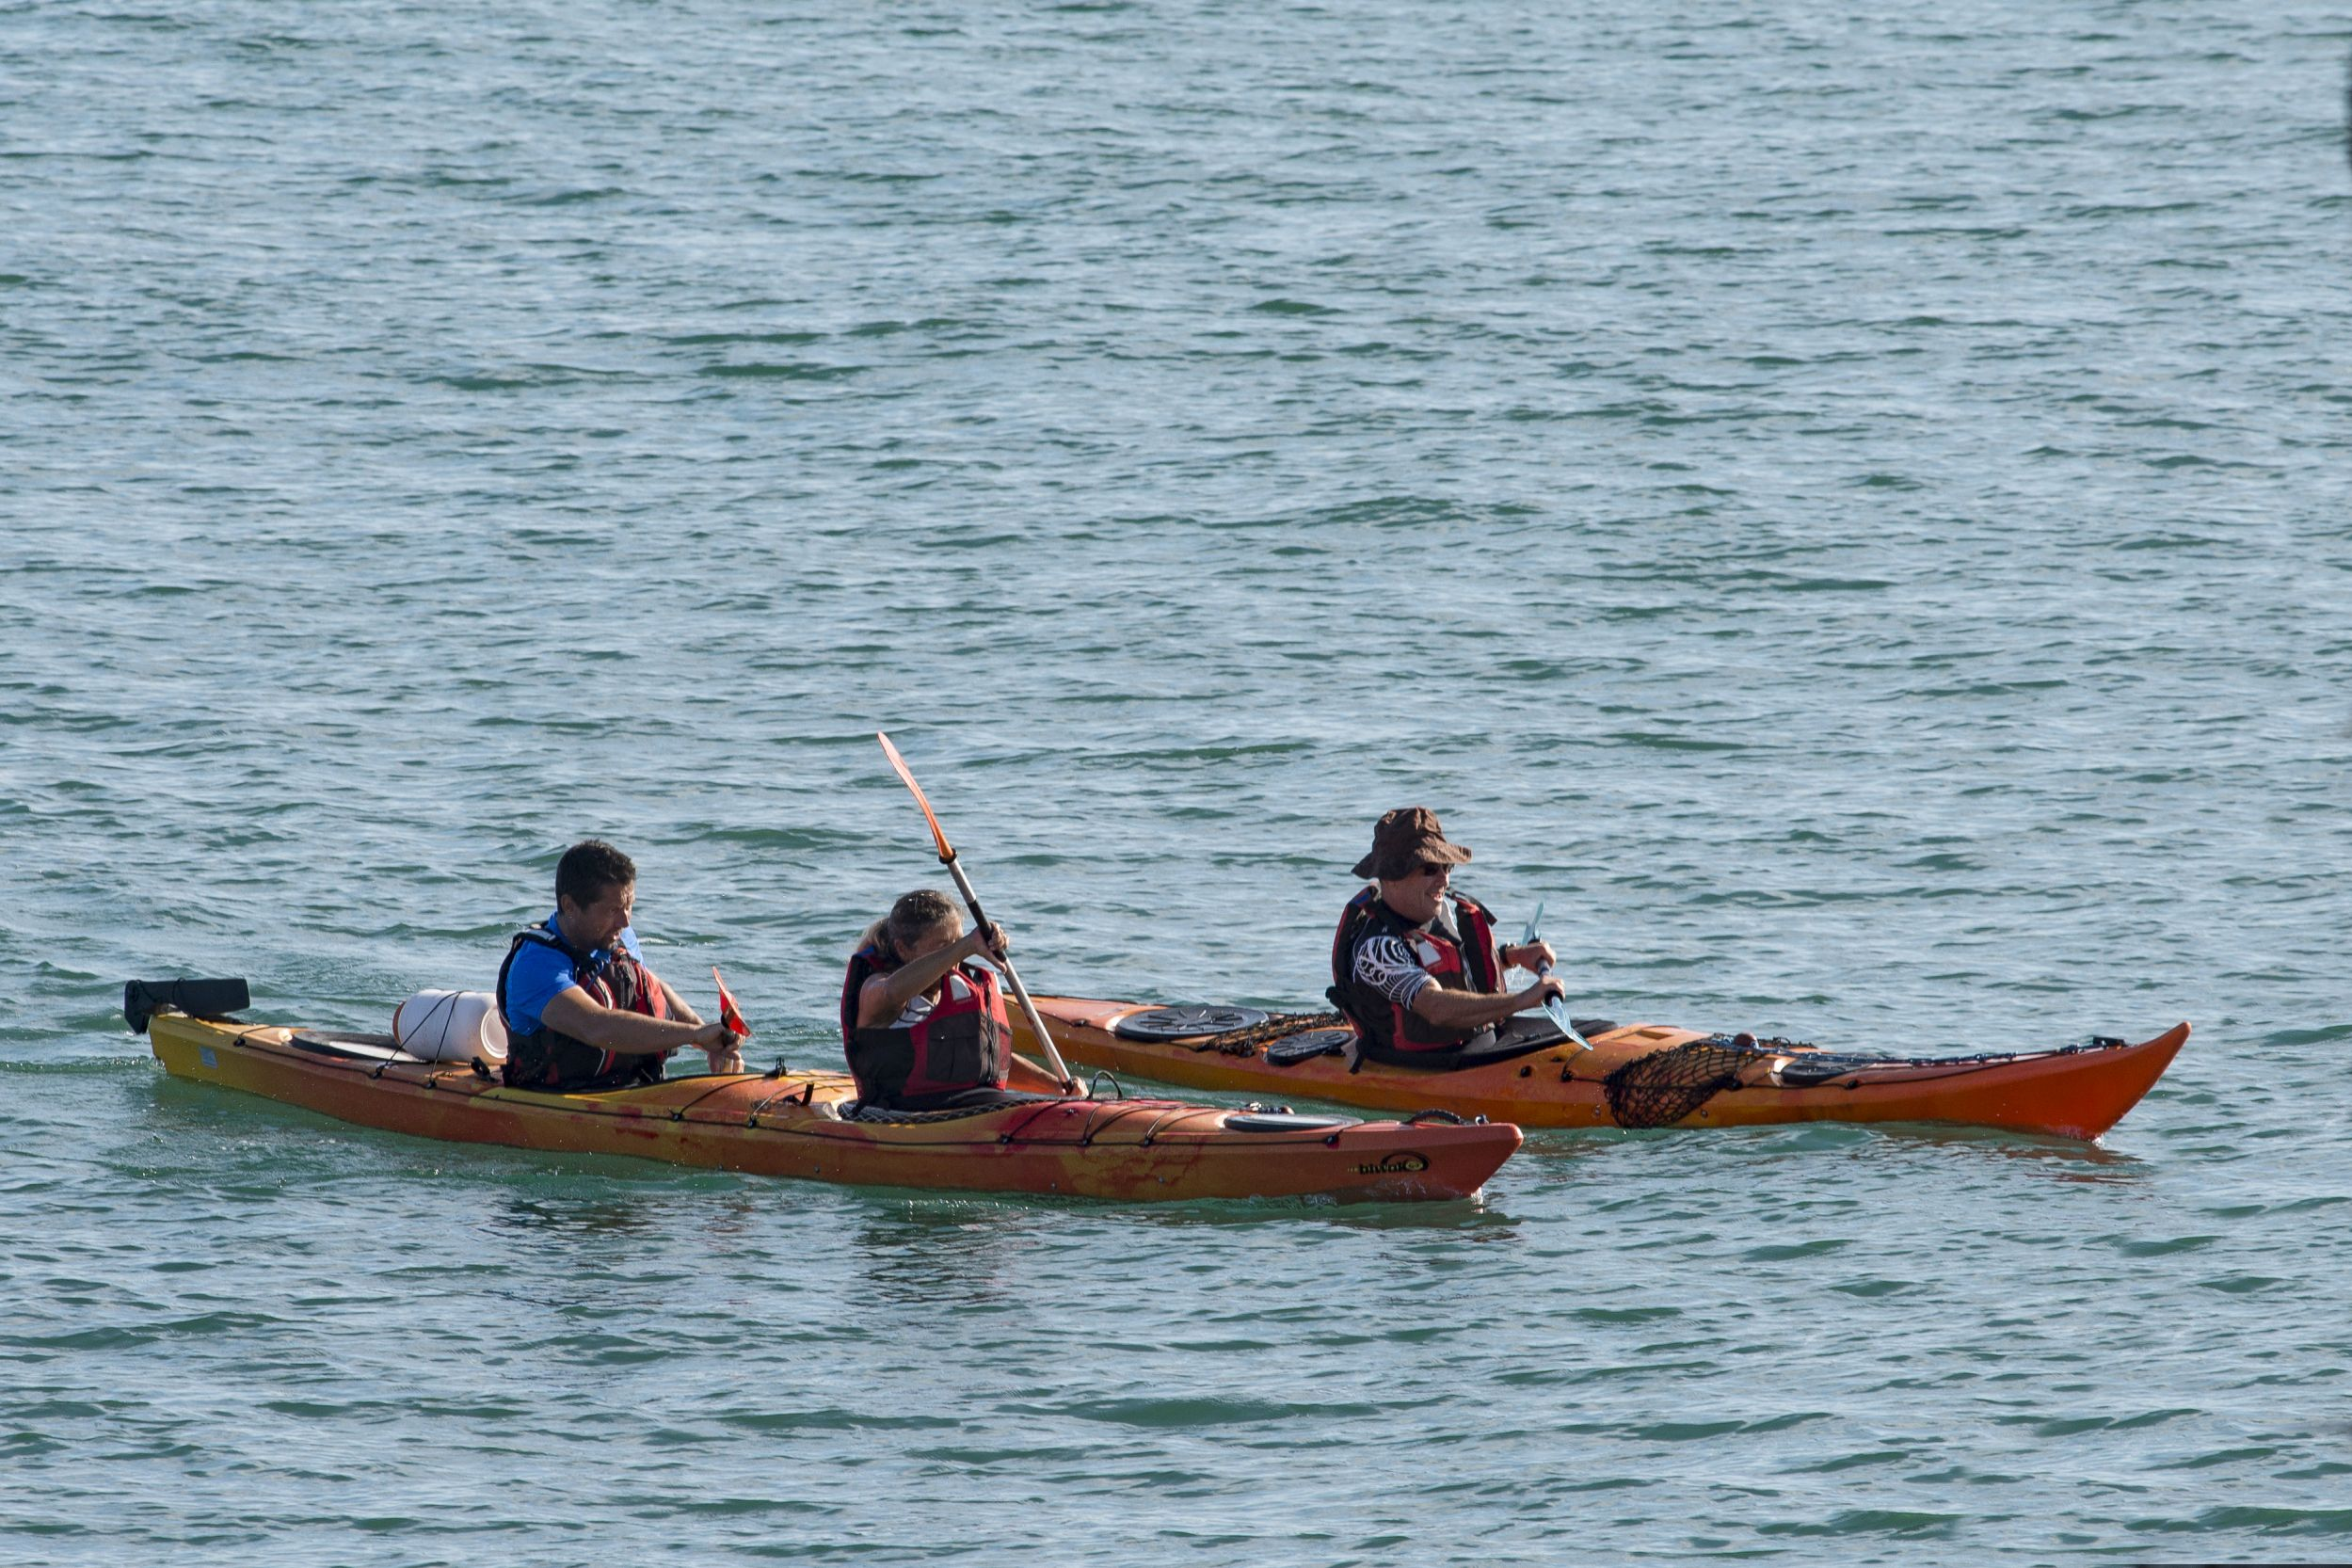 Abonnement annuel loisir (Kayak / Paddle / Kayasurf / Wave ski / Randonnées) image 1